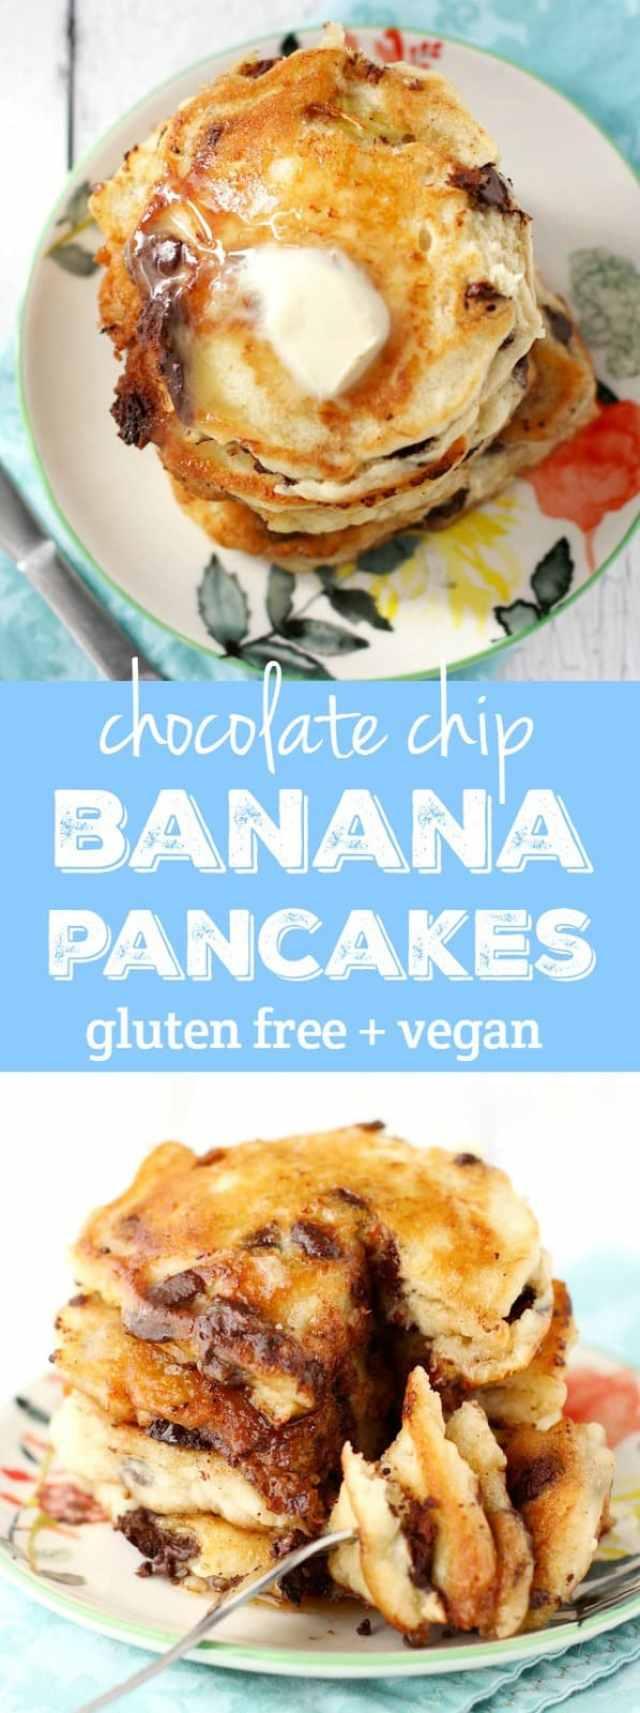 Gluten Free and Vegan Chocolate Chip Banana Pancakes. - The Pretty Bee